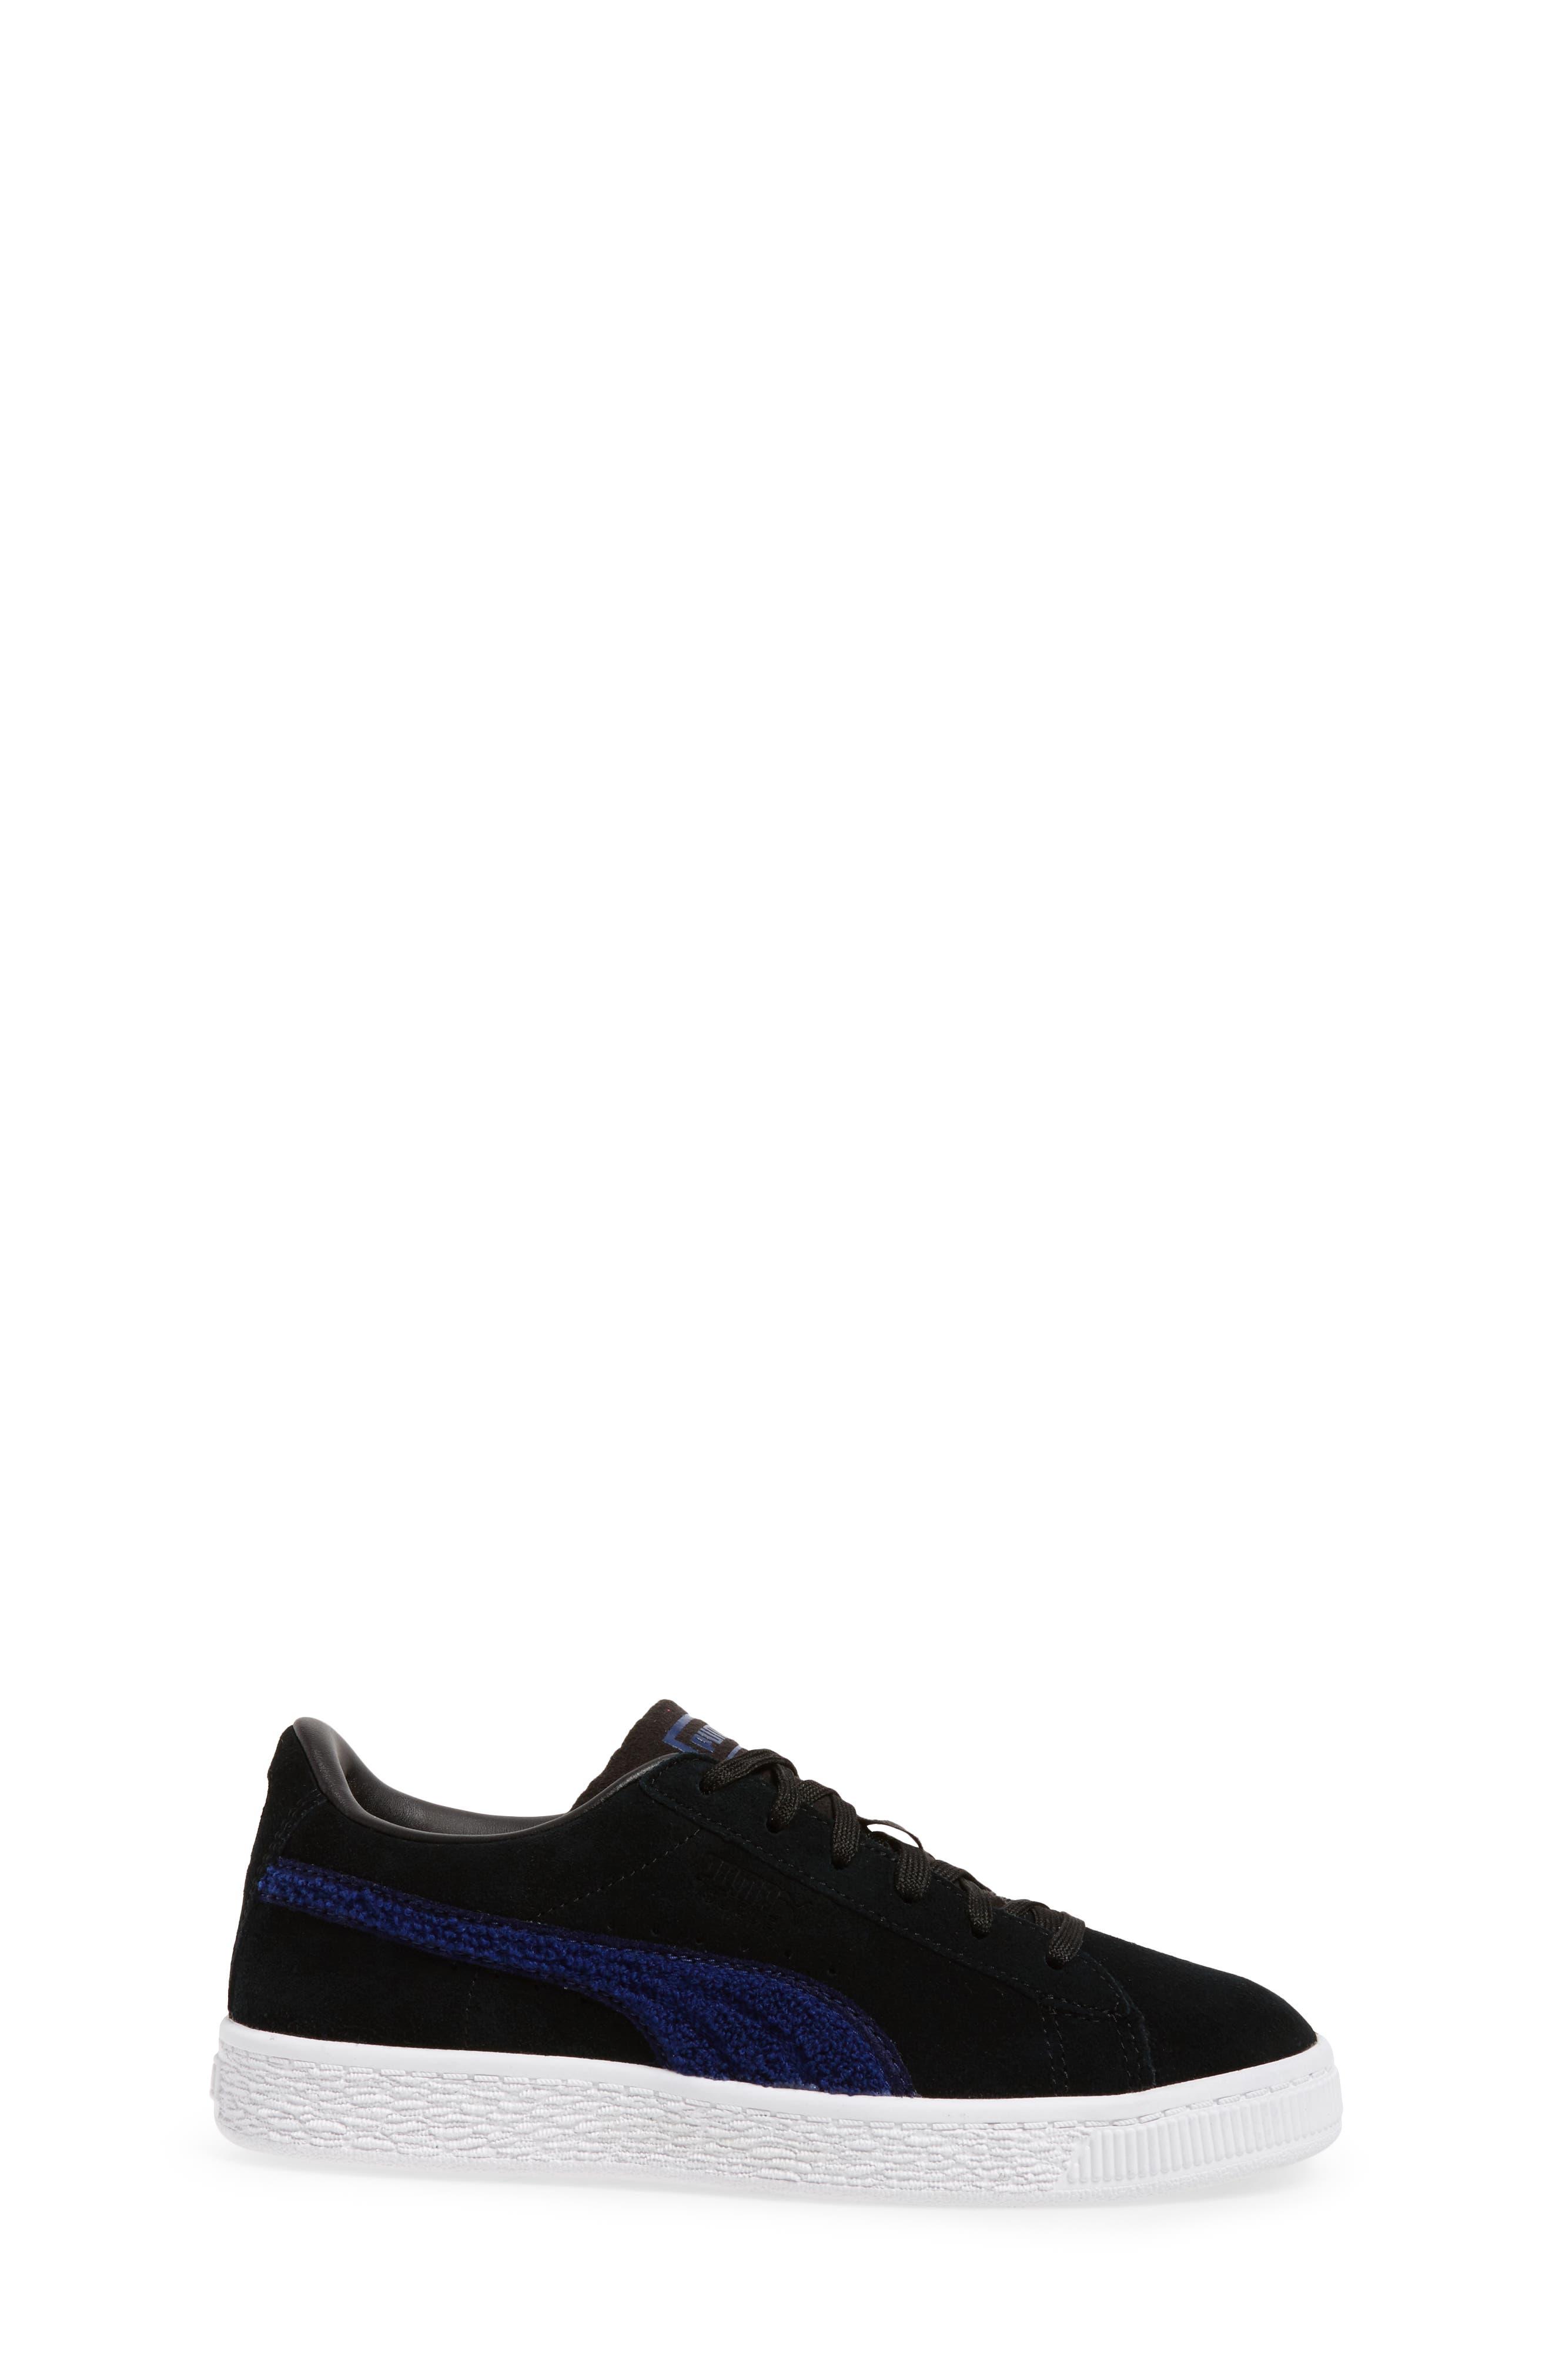 Alternate Image 3  - PUMA Classic Terry Sneaker (Toddler, Little Kid & Big Kid)